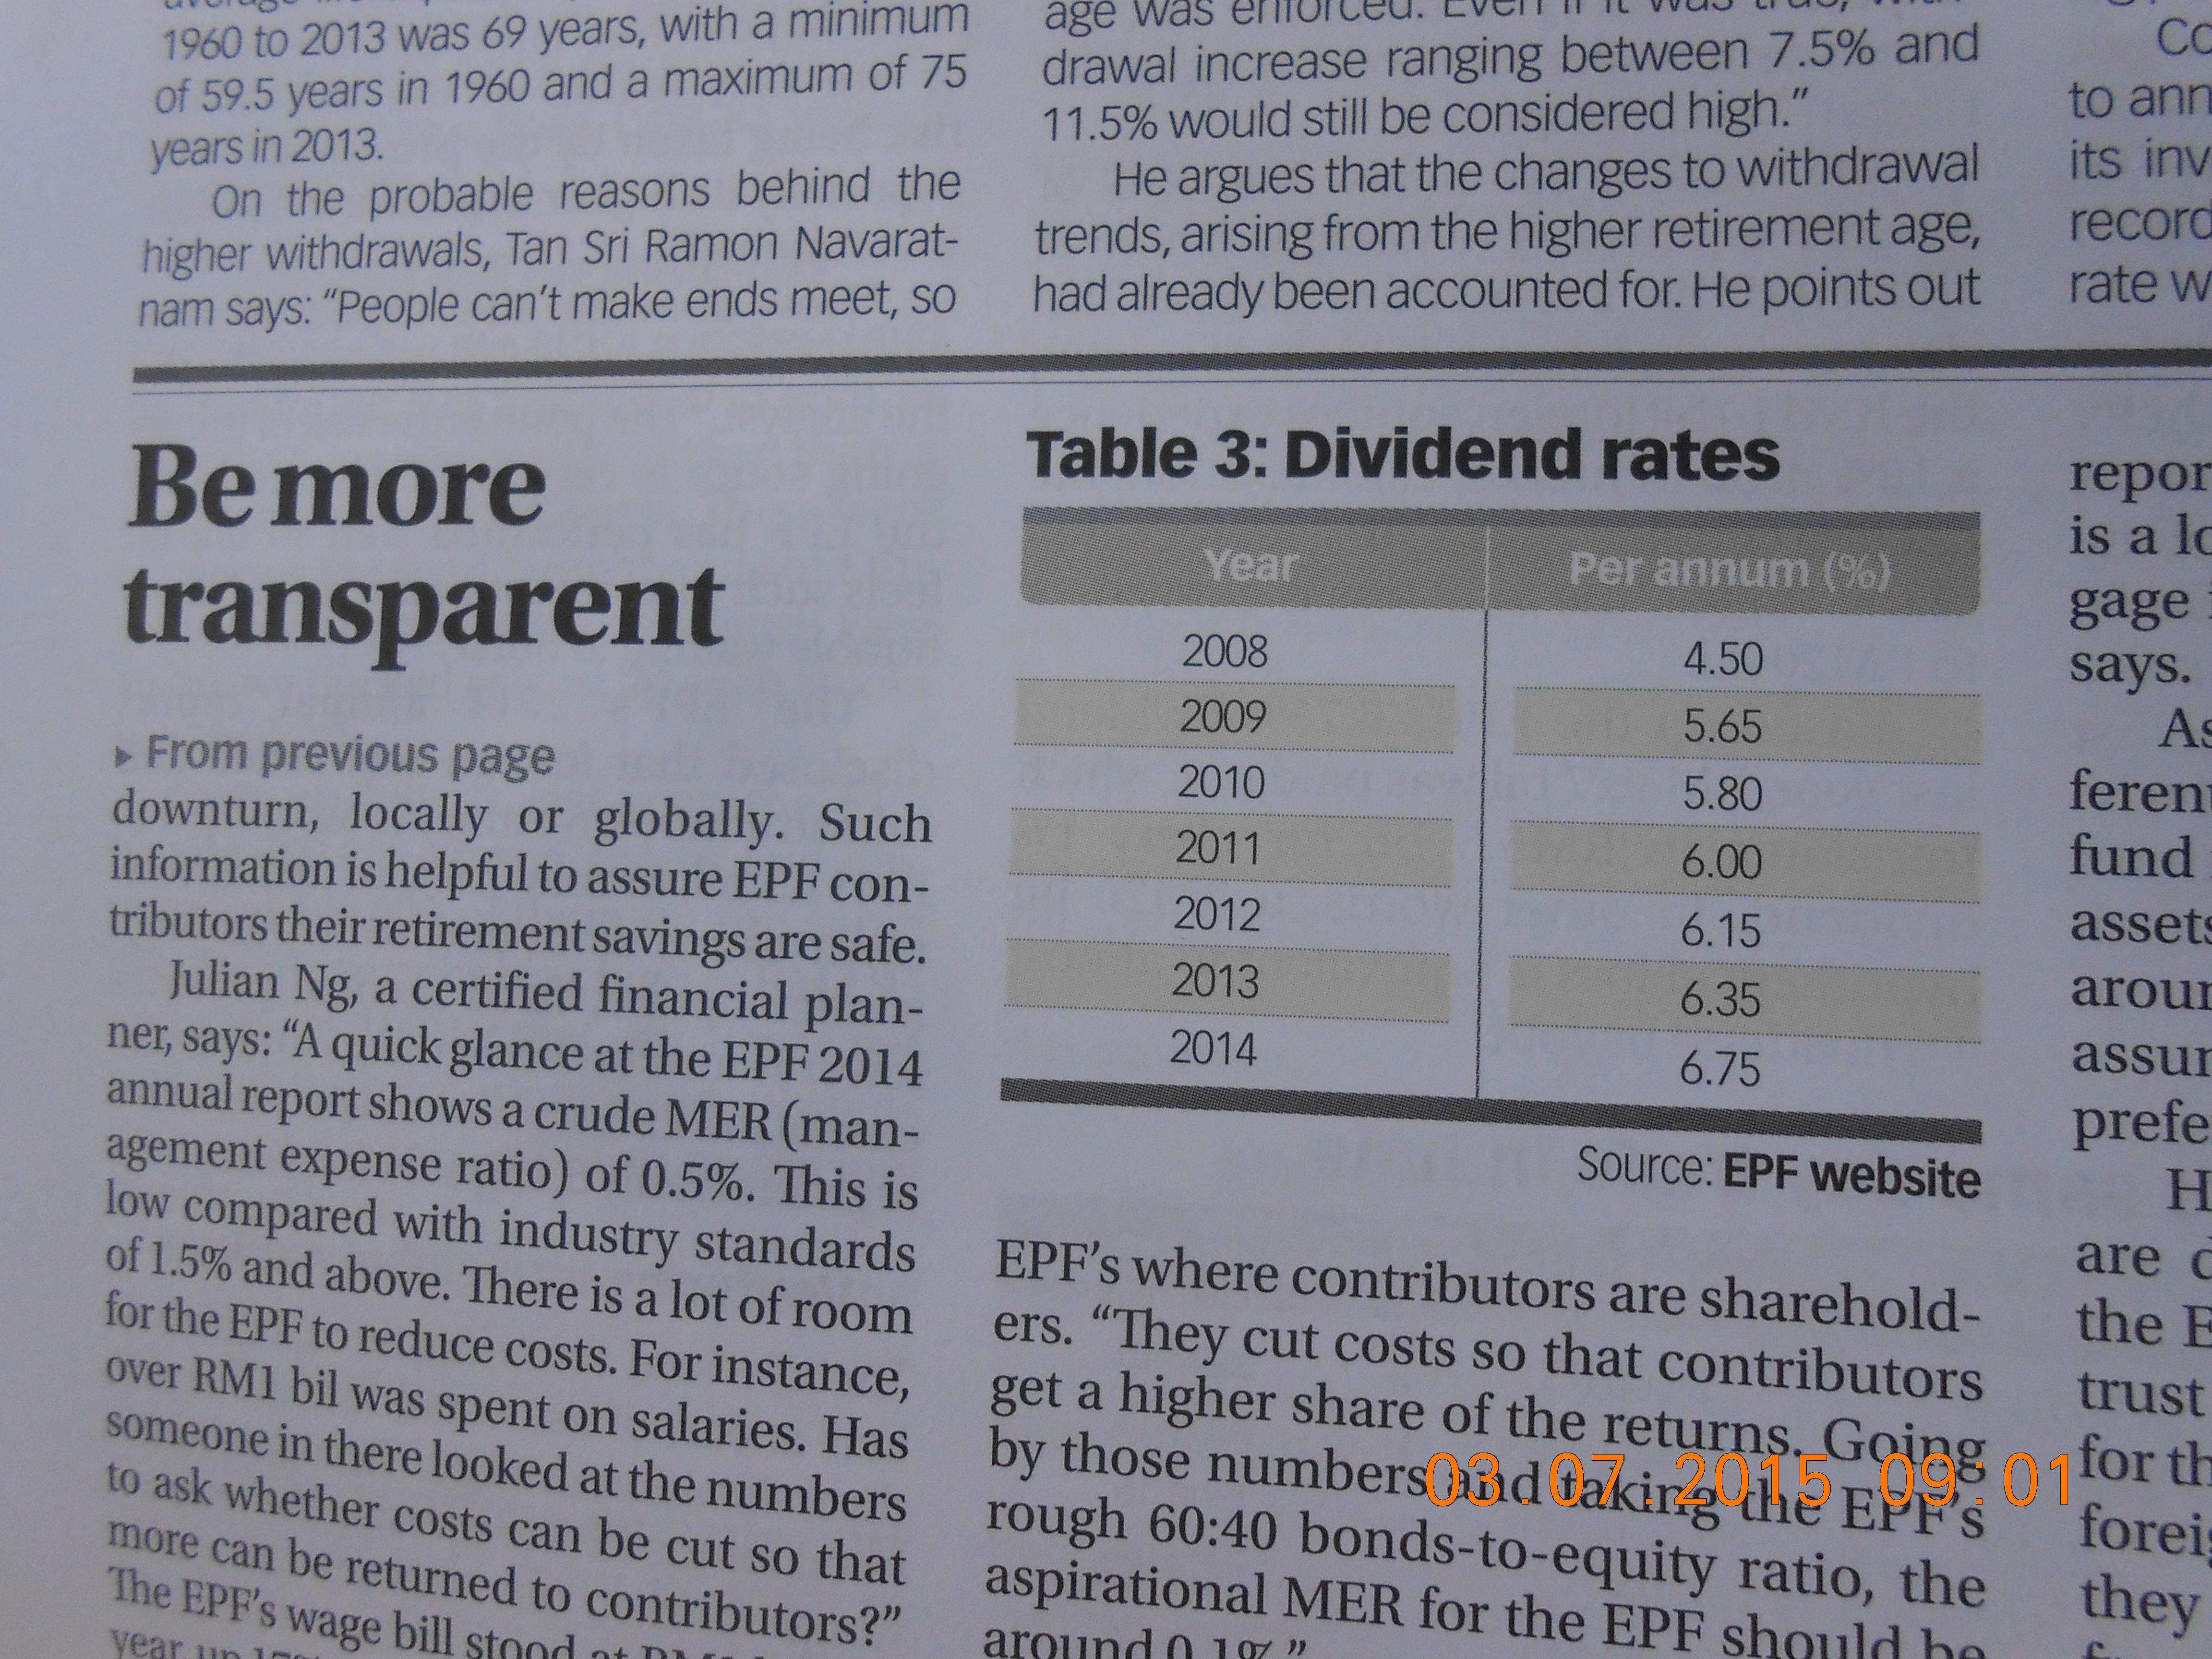 epf investment scheme public mutual berhad » rpersebome cf